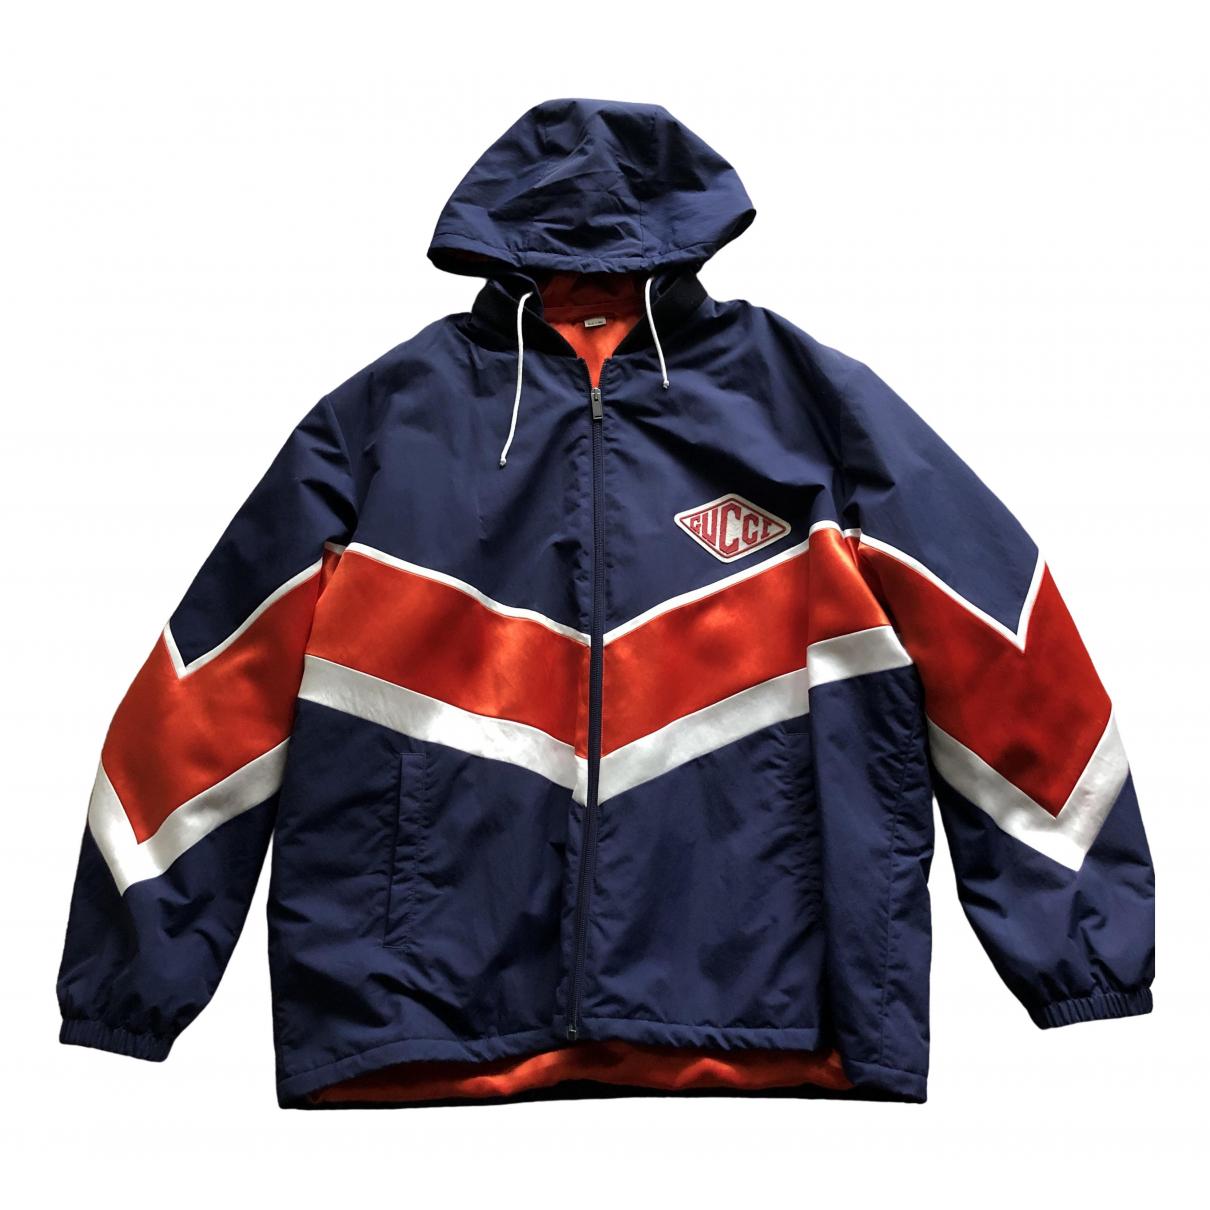 Gucci \N Multicolour jacket  for Men XL International